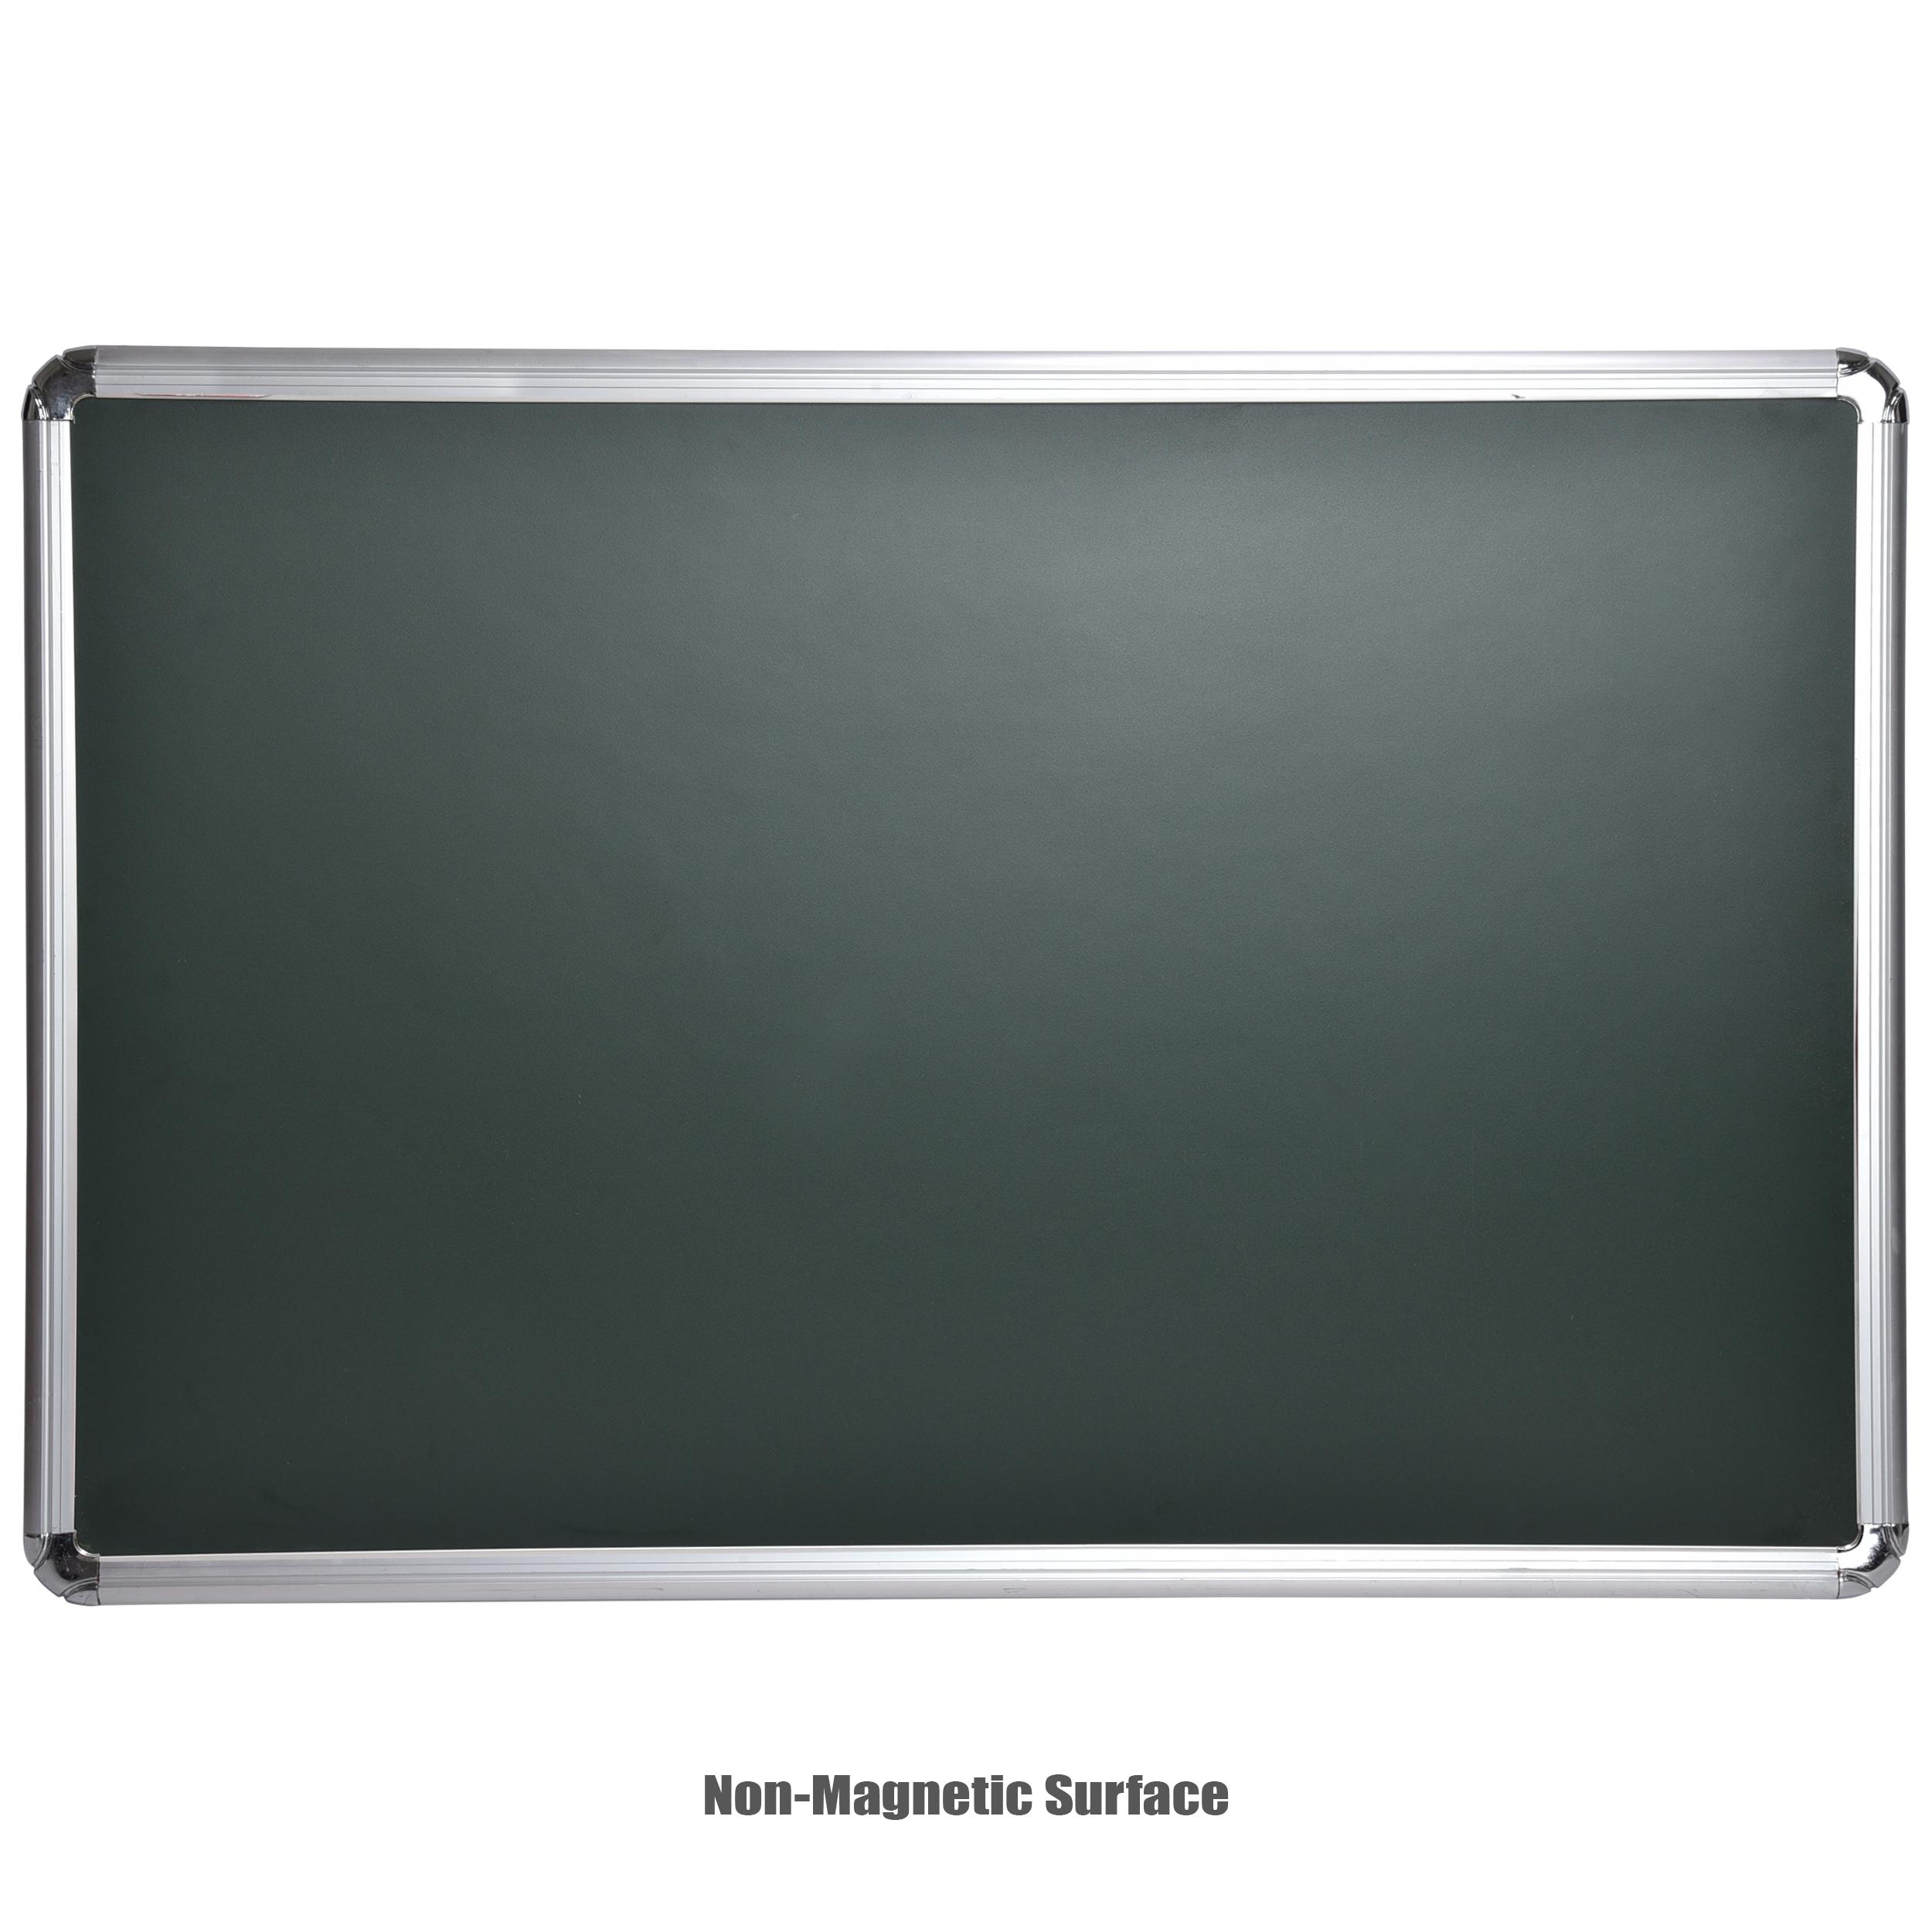 Green Chalkboards Premium quality